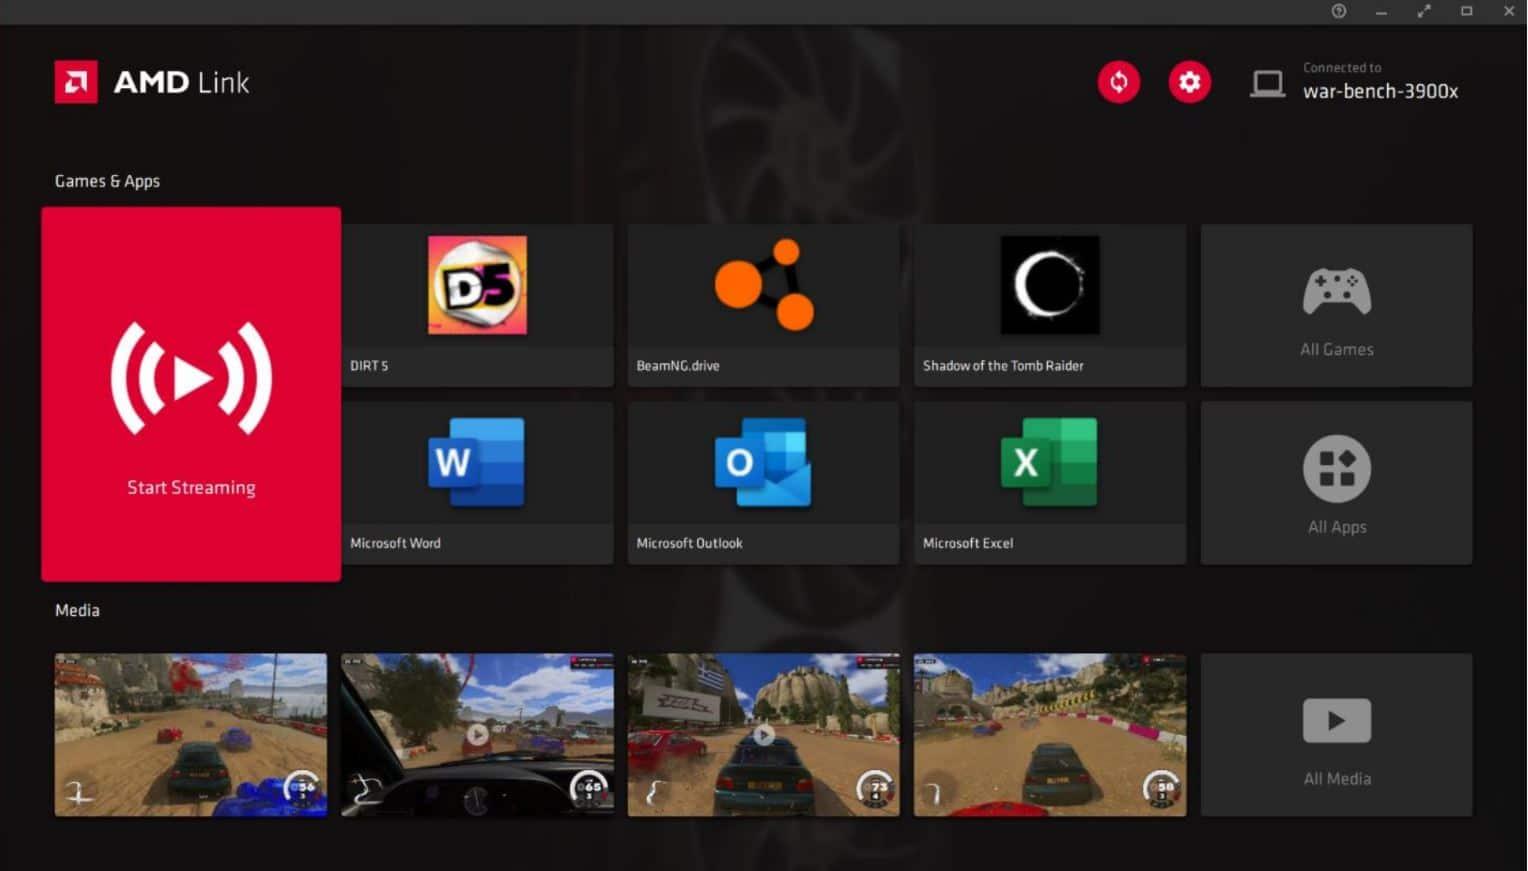 AMD Radeon Software Adrenalin 21.4.1, AMD LINK 8, GamersRD